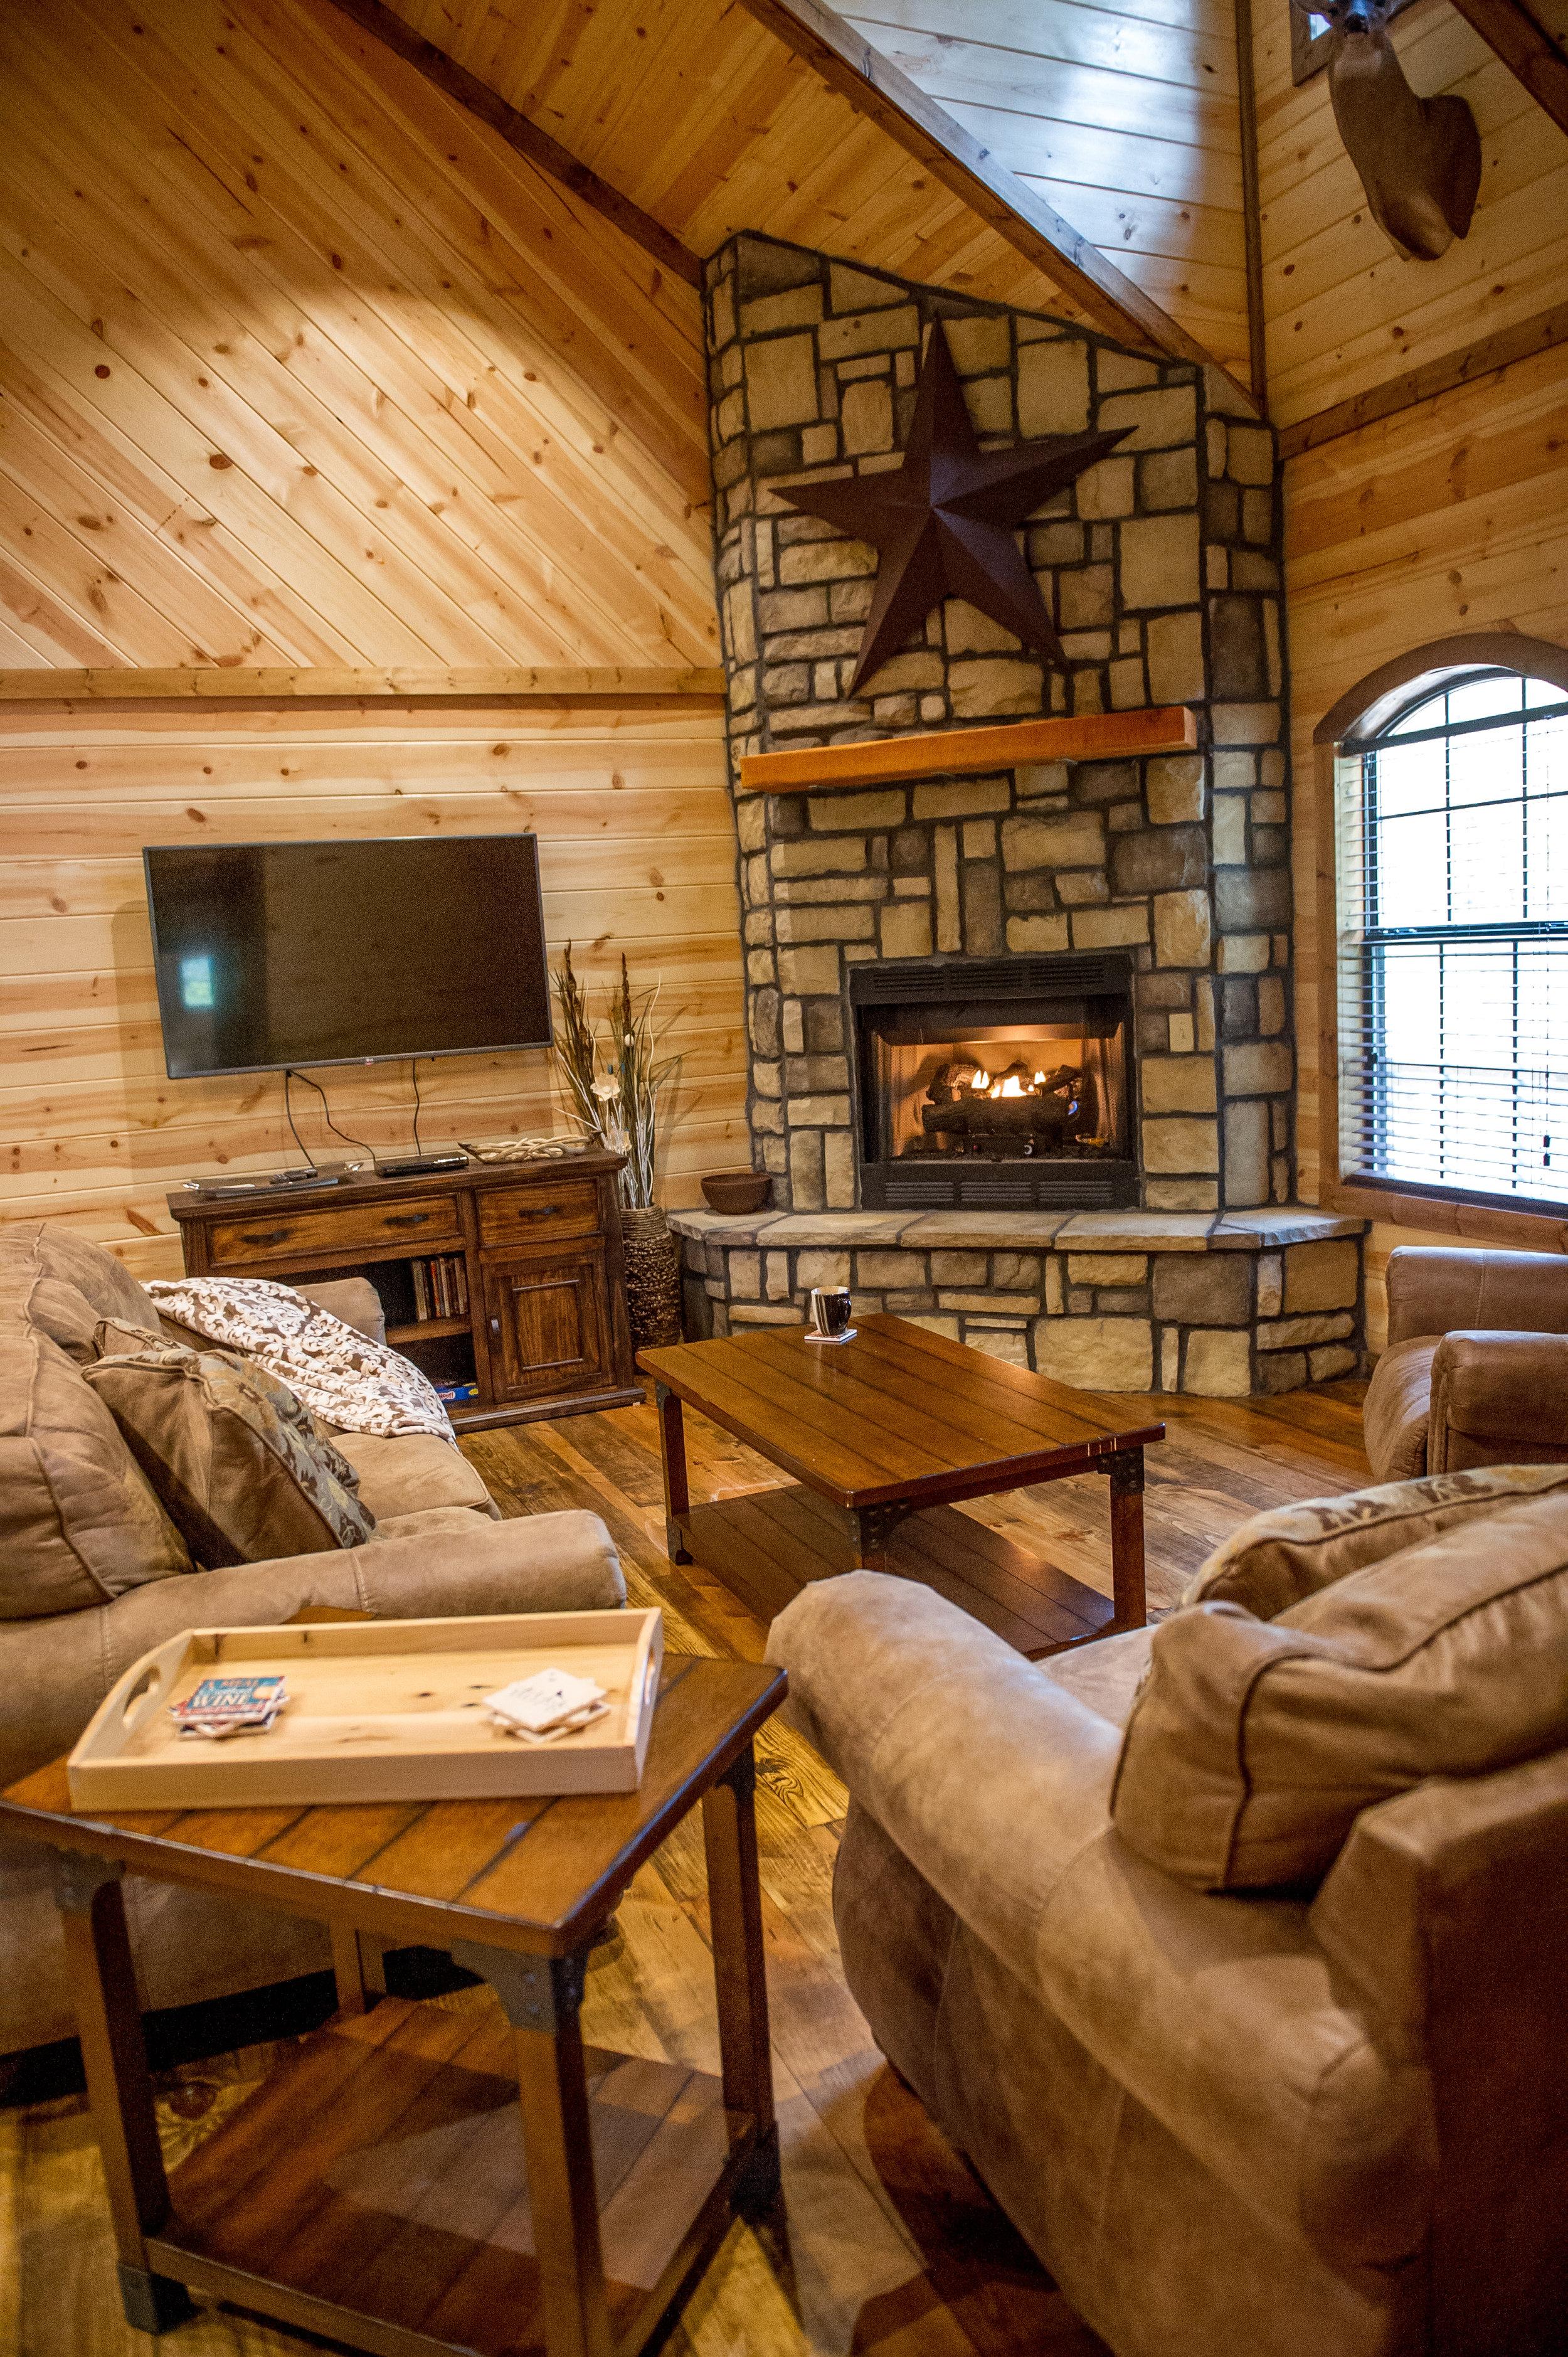 Living Room - Fireplace cropped.jpg.jpg